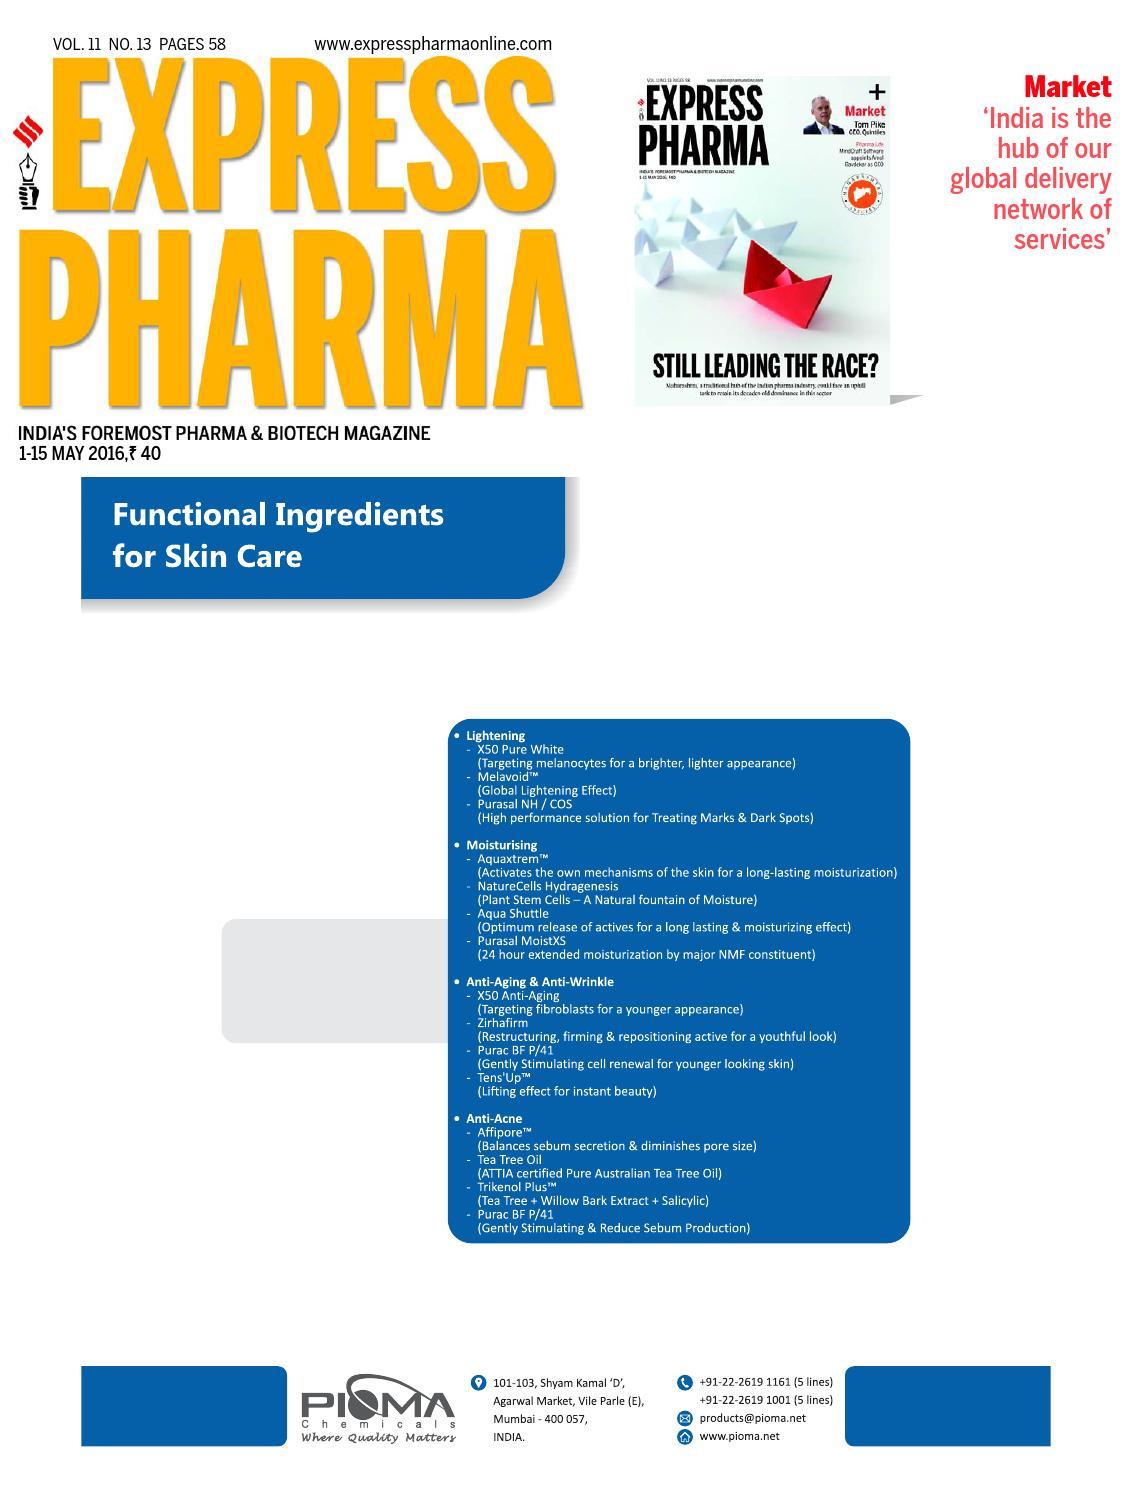 Express Pharma Vol11 No13 May 1 15 2016 By Indian Express Issuu